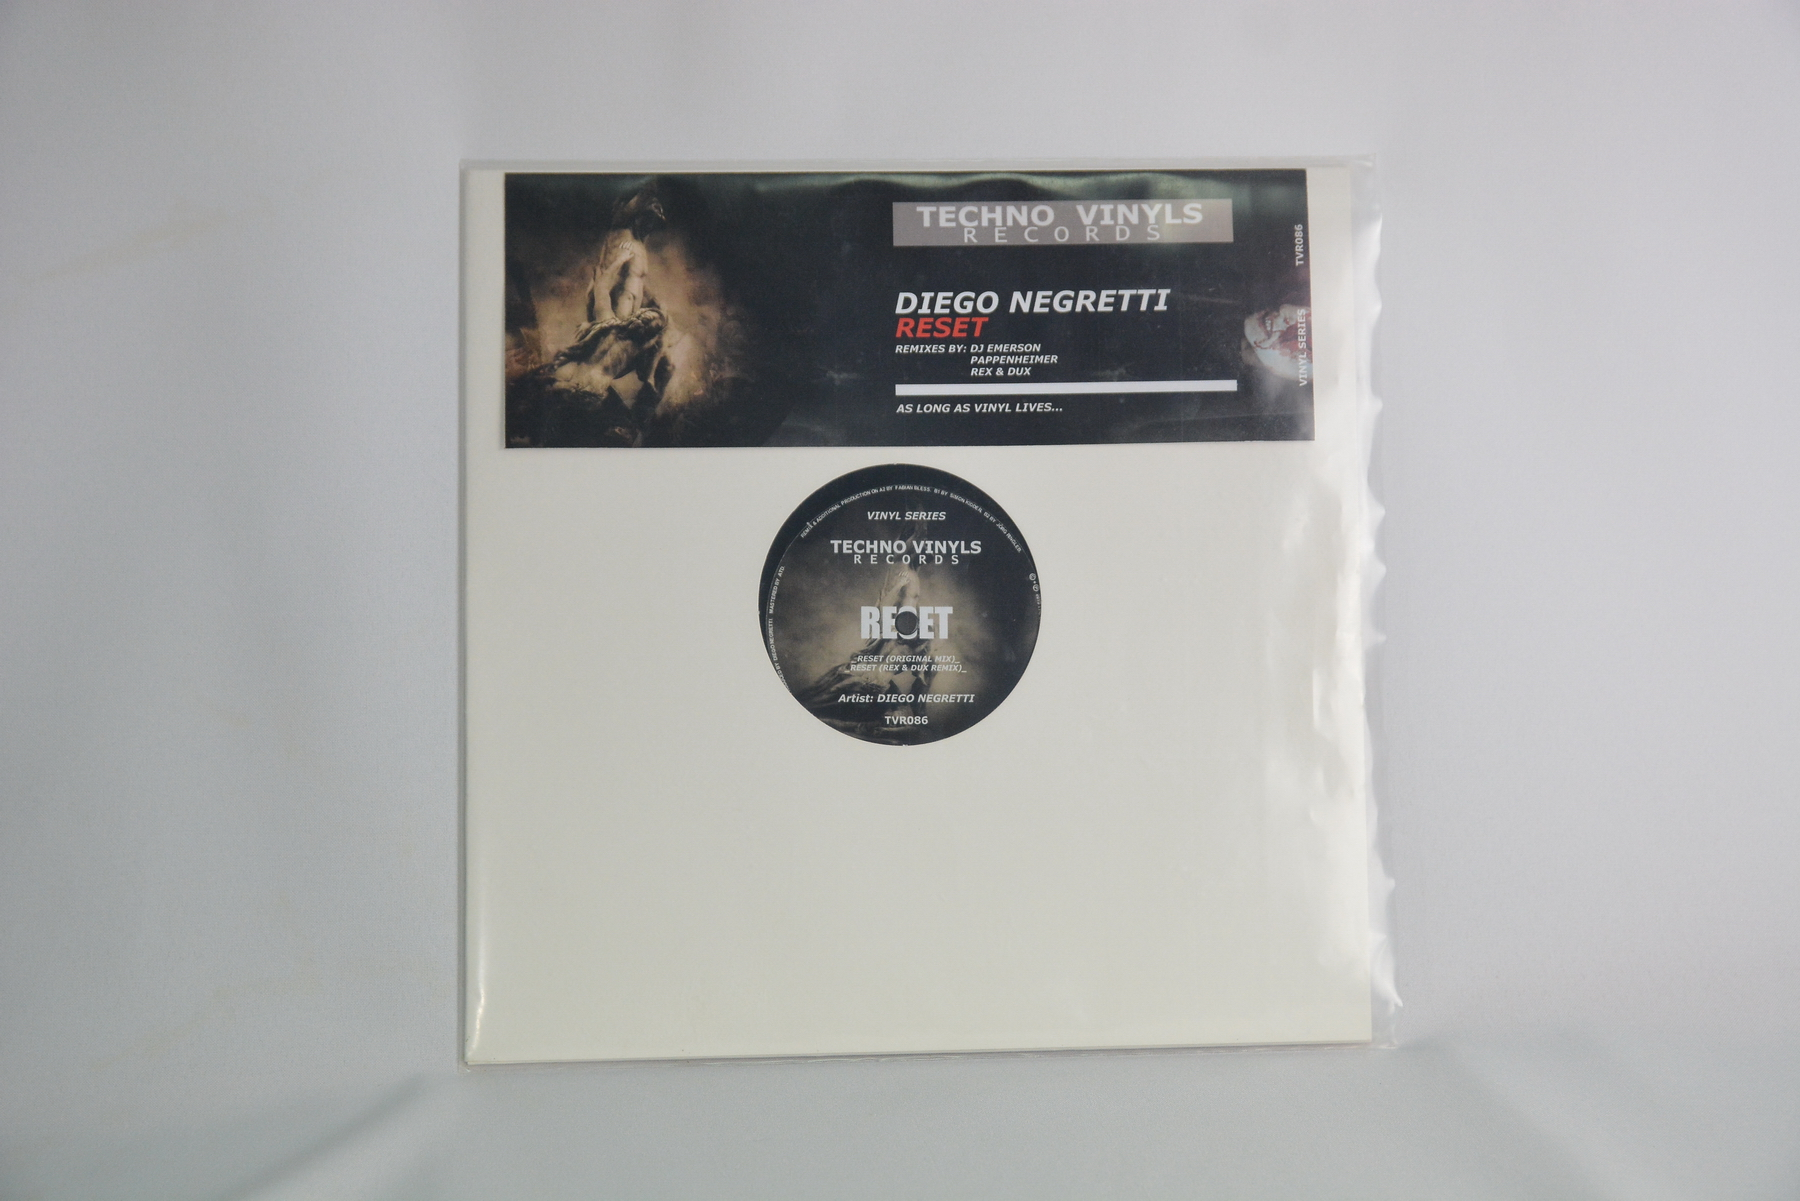 Diego Negretti – Reset  EP